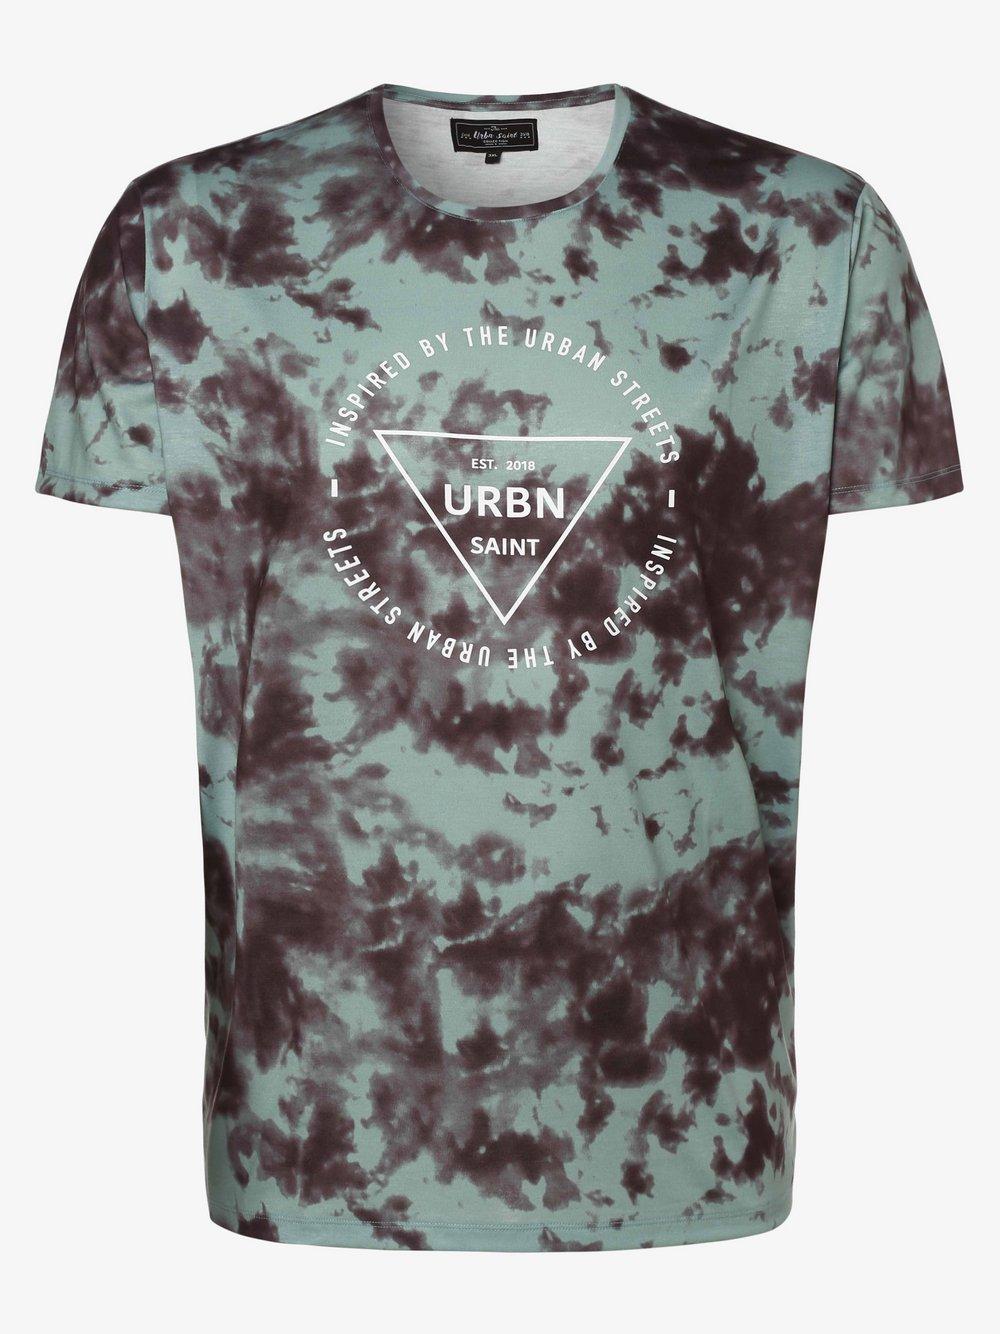 URBN SAINT – T-shirt męski – USThome, zielony Van Graaf 469726-0001-09995